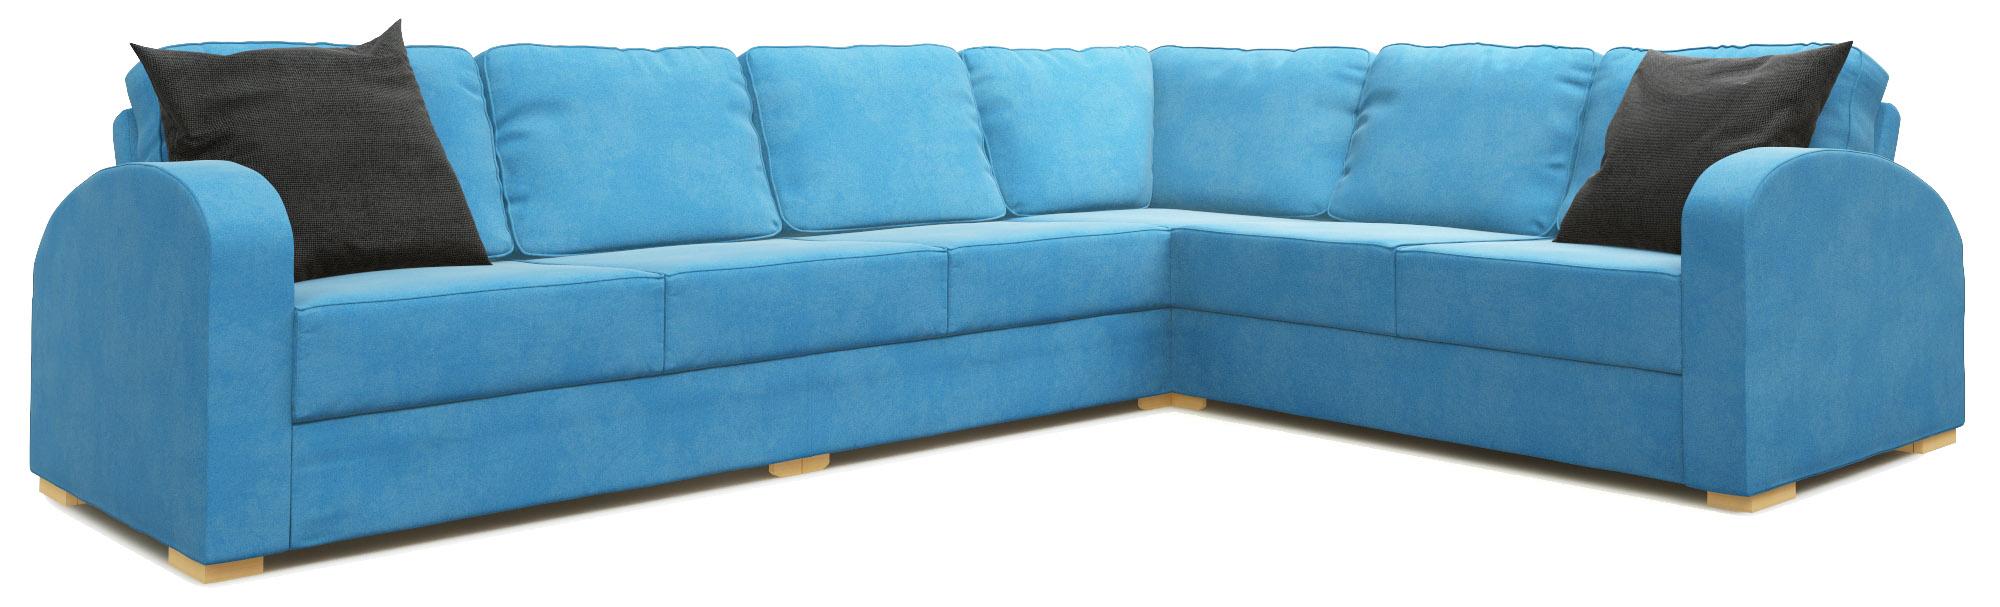 Holl 4X3 Corner Double Sofa Bed